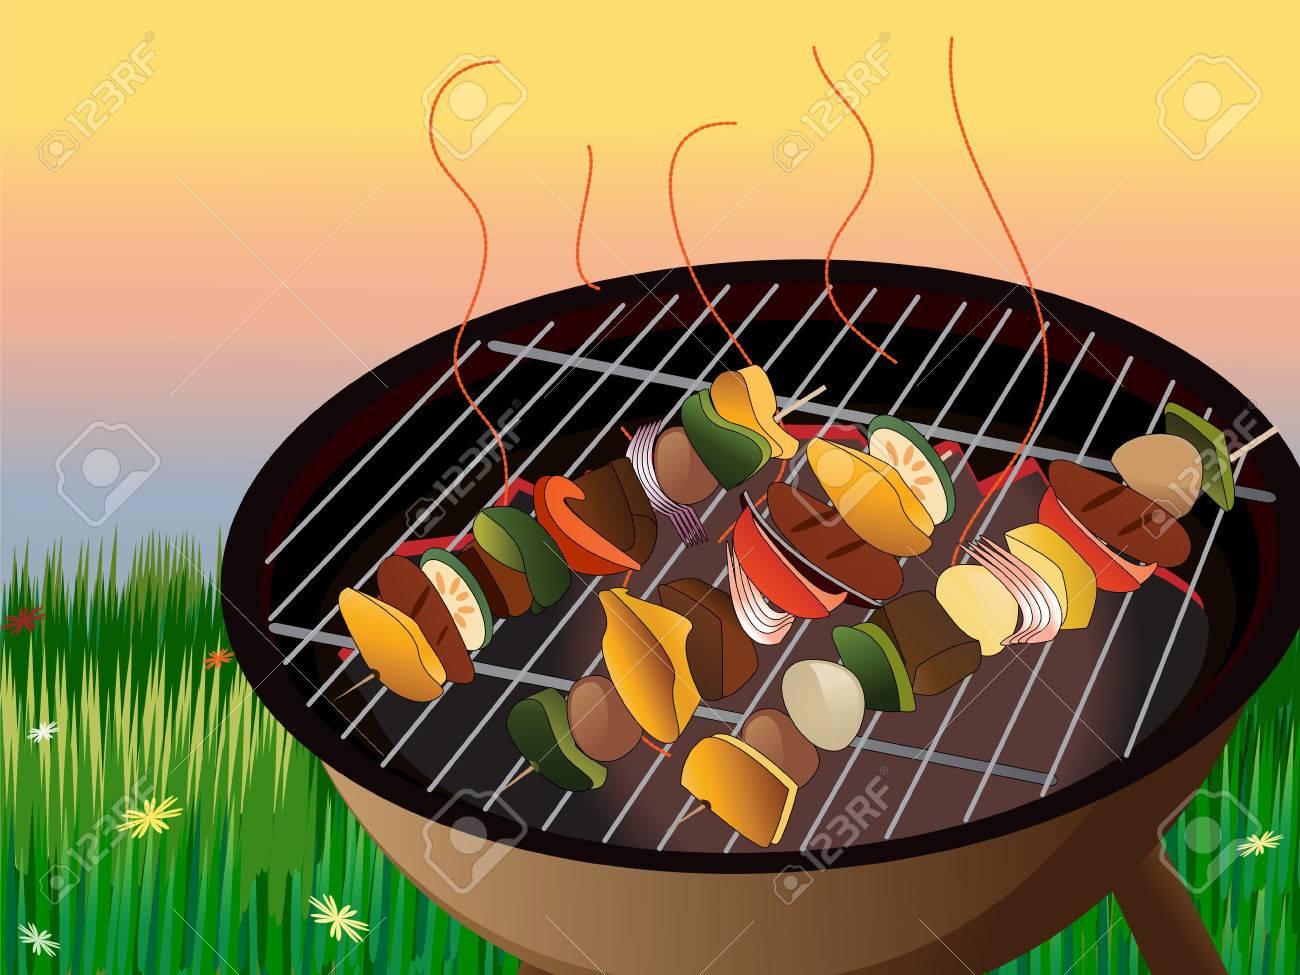 illustration of backyard bbq scene vegetables and meat on skewer